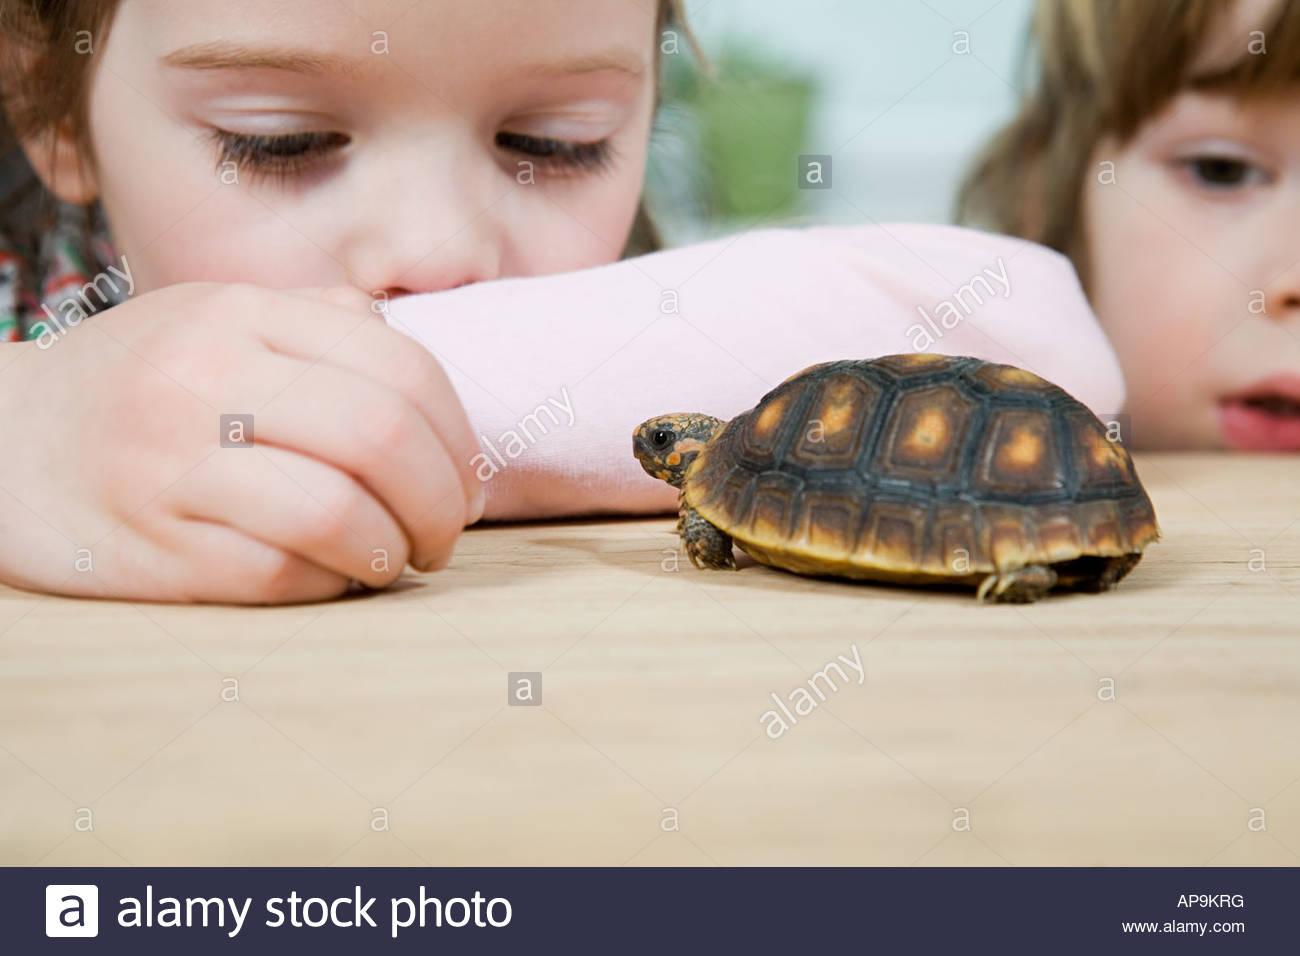 A girl feeding a tortoise - Stock Image